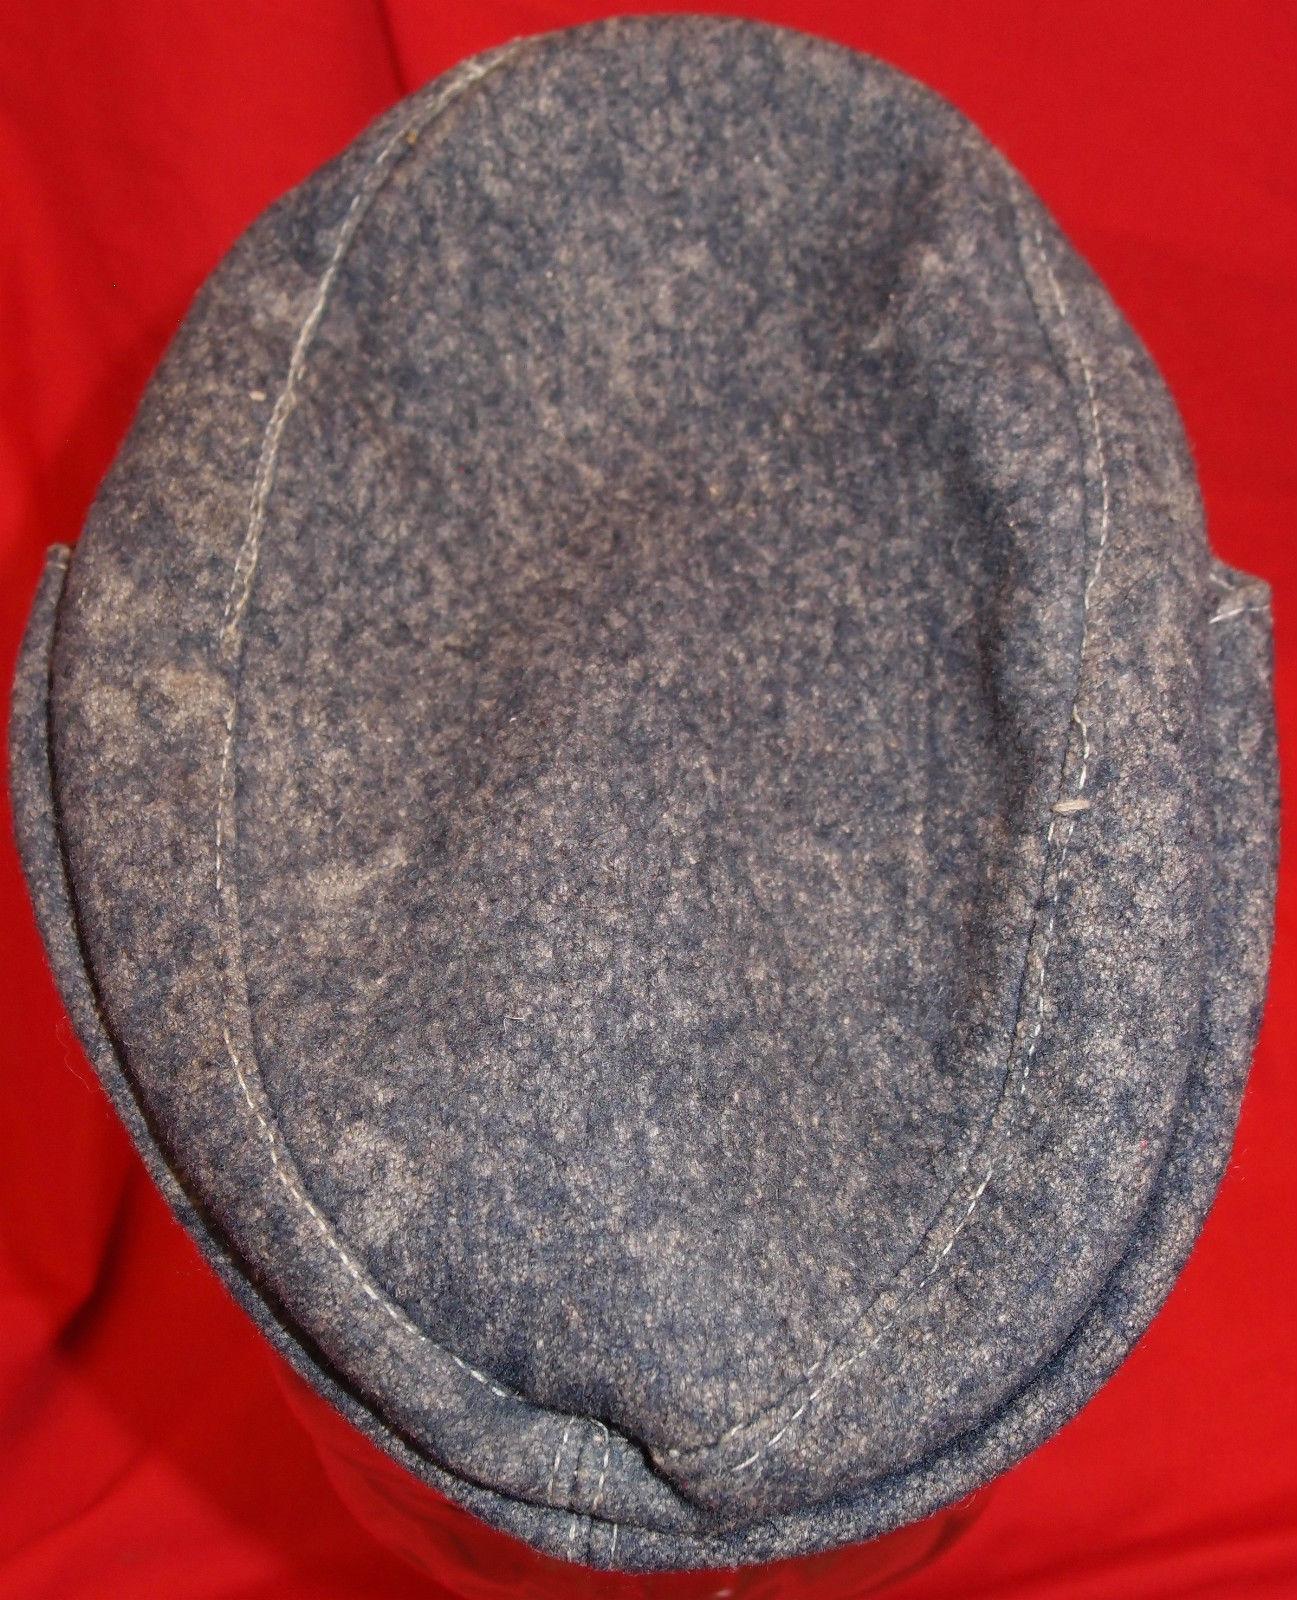 WW2 GERMAN LUFTWAFFE M43 ENLISTED FIELD CAP